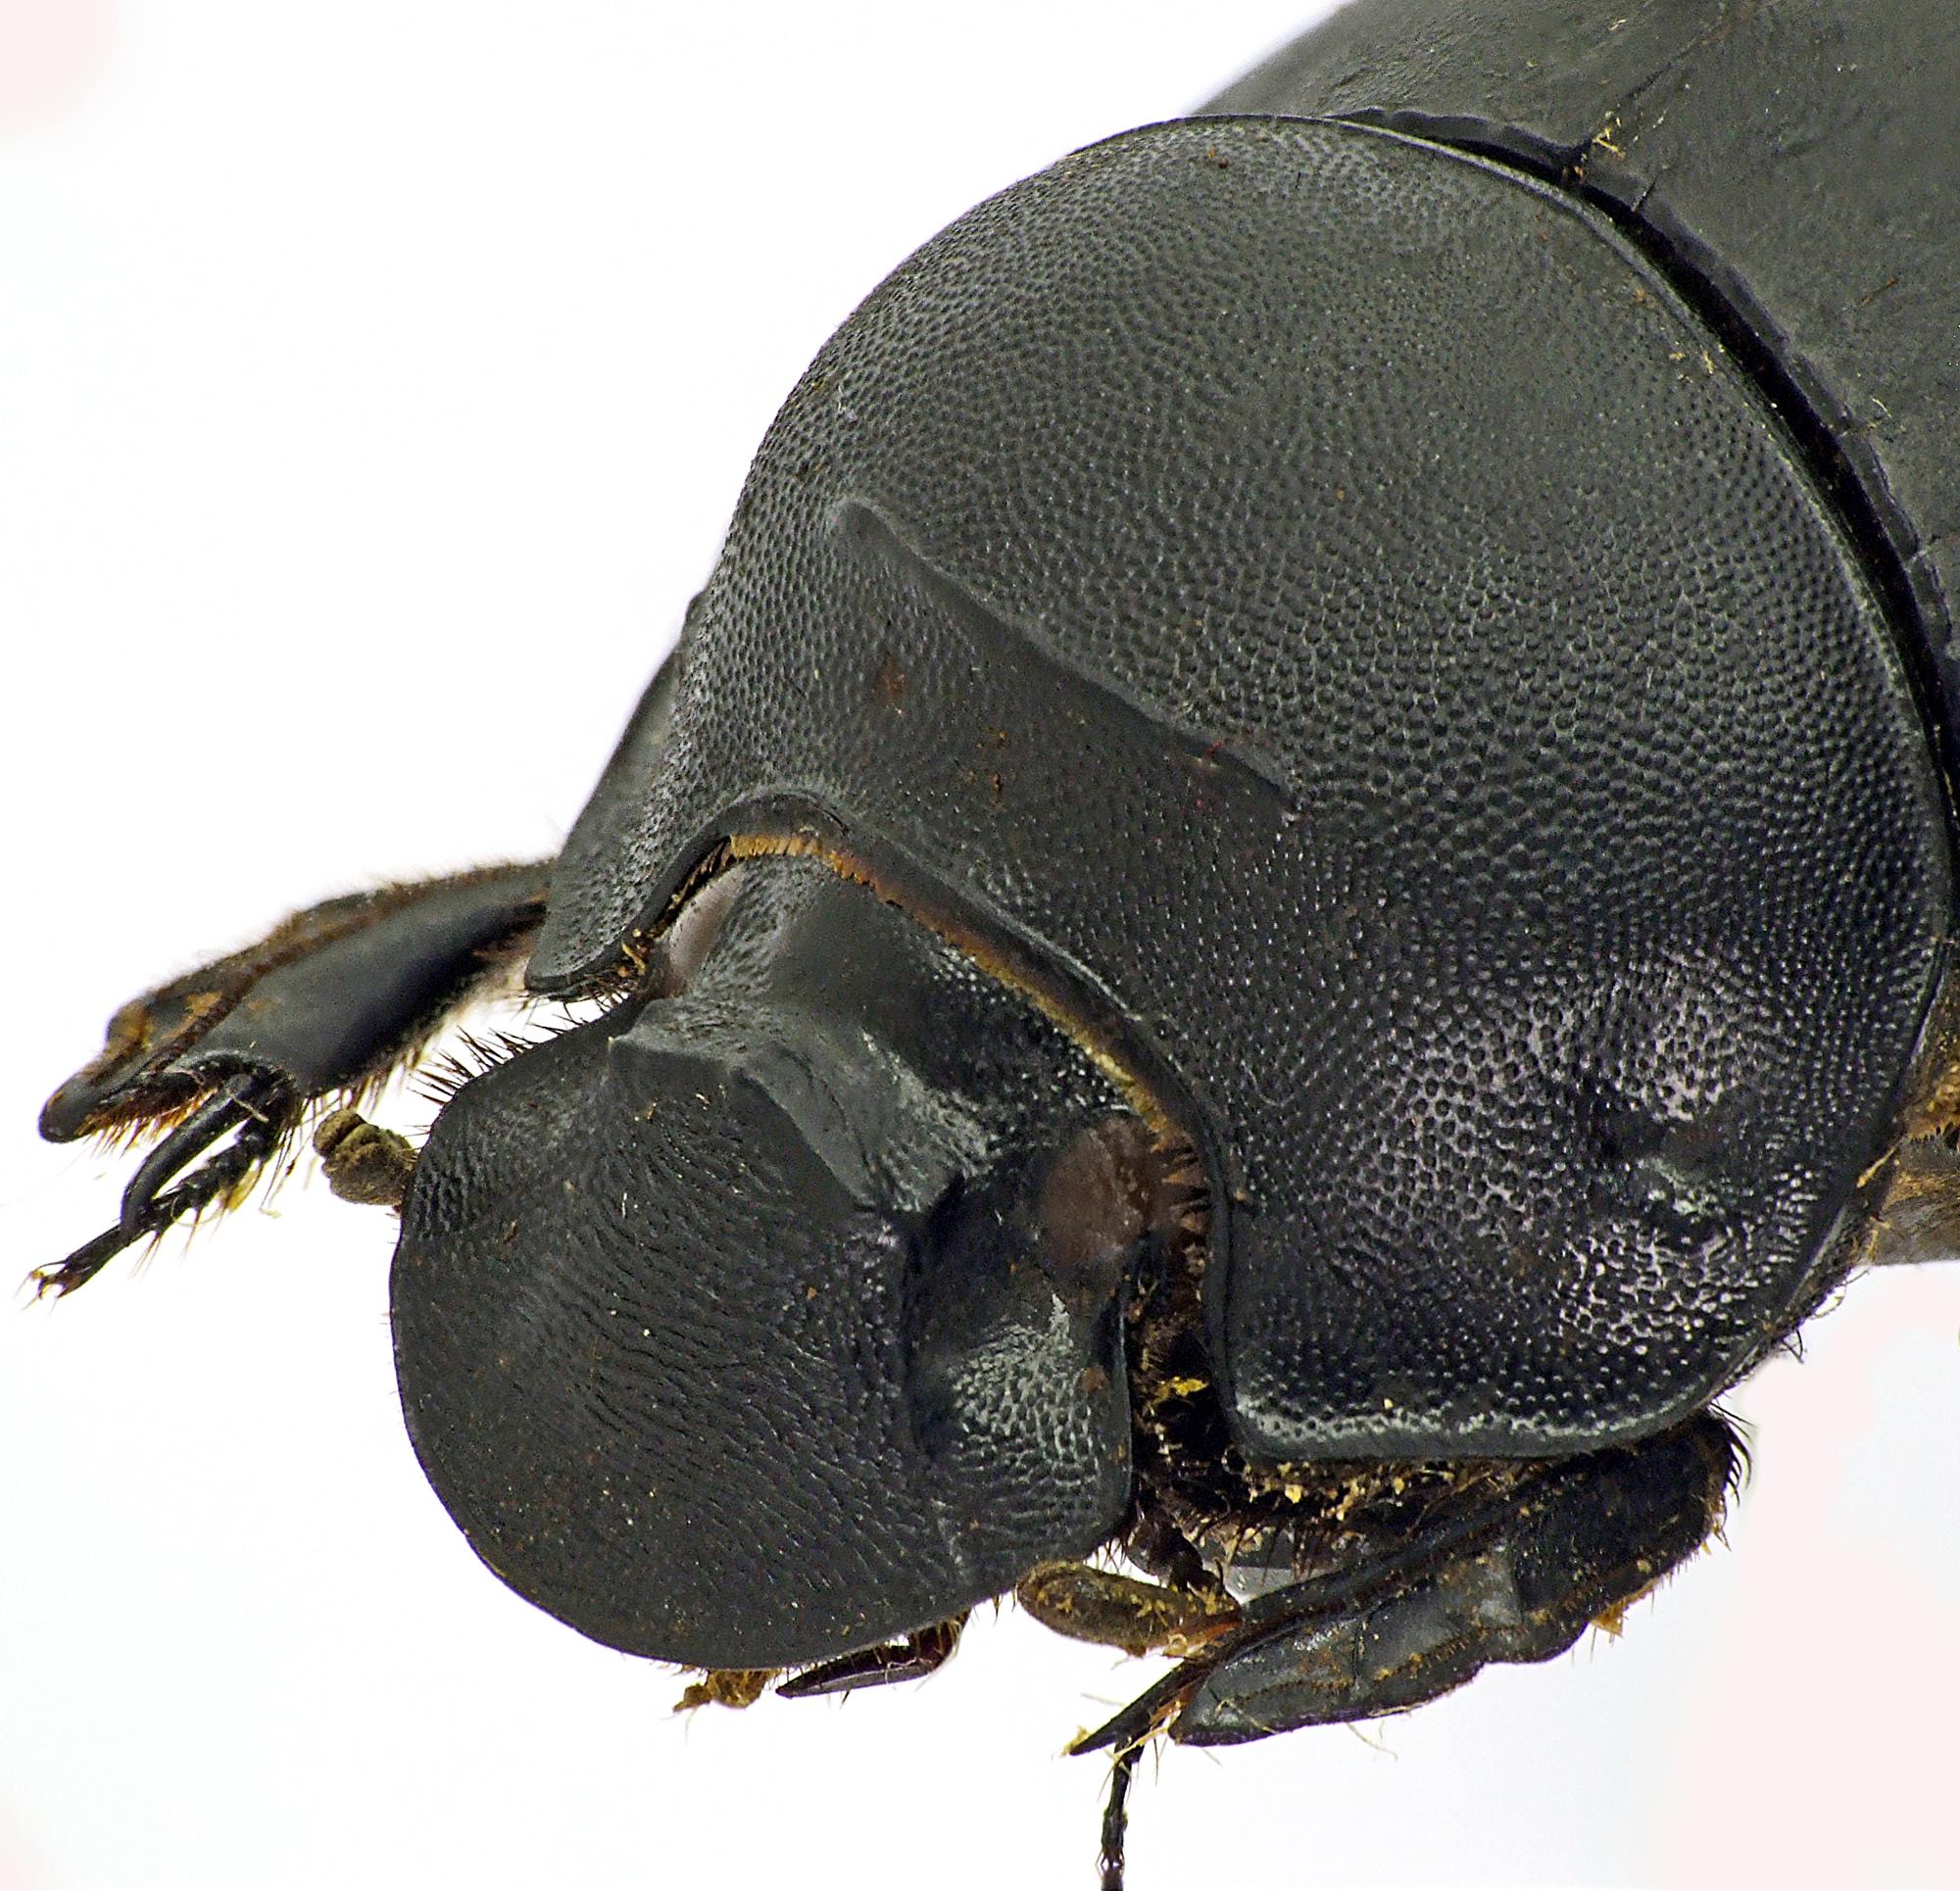 Catharsius rhinoceros 41266cz71.jpg